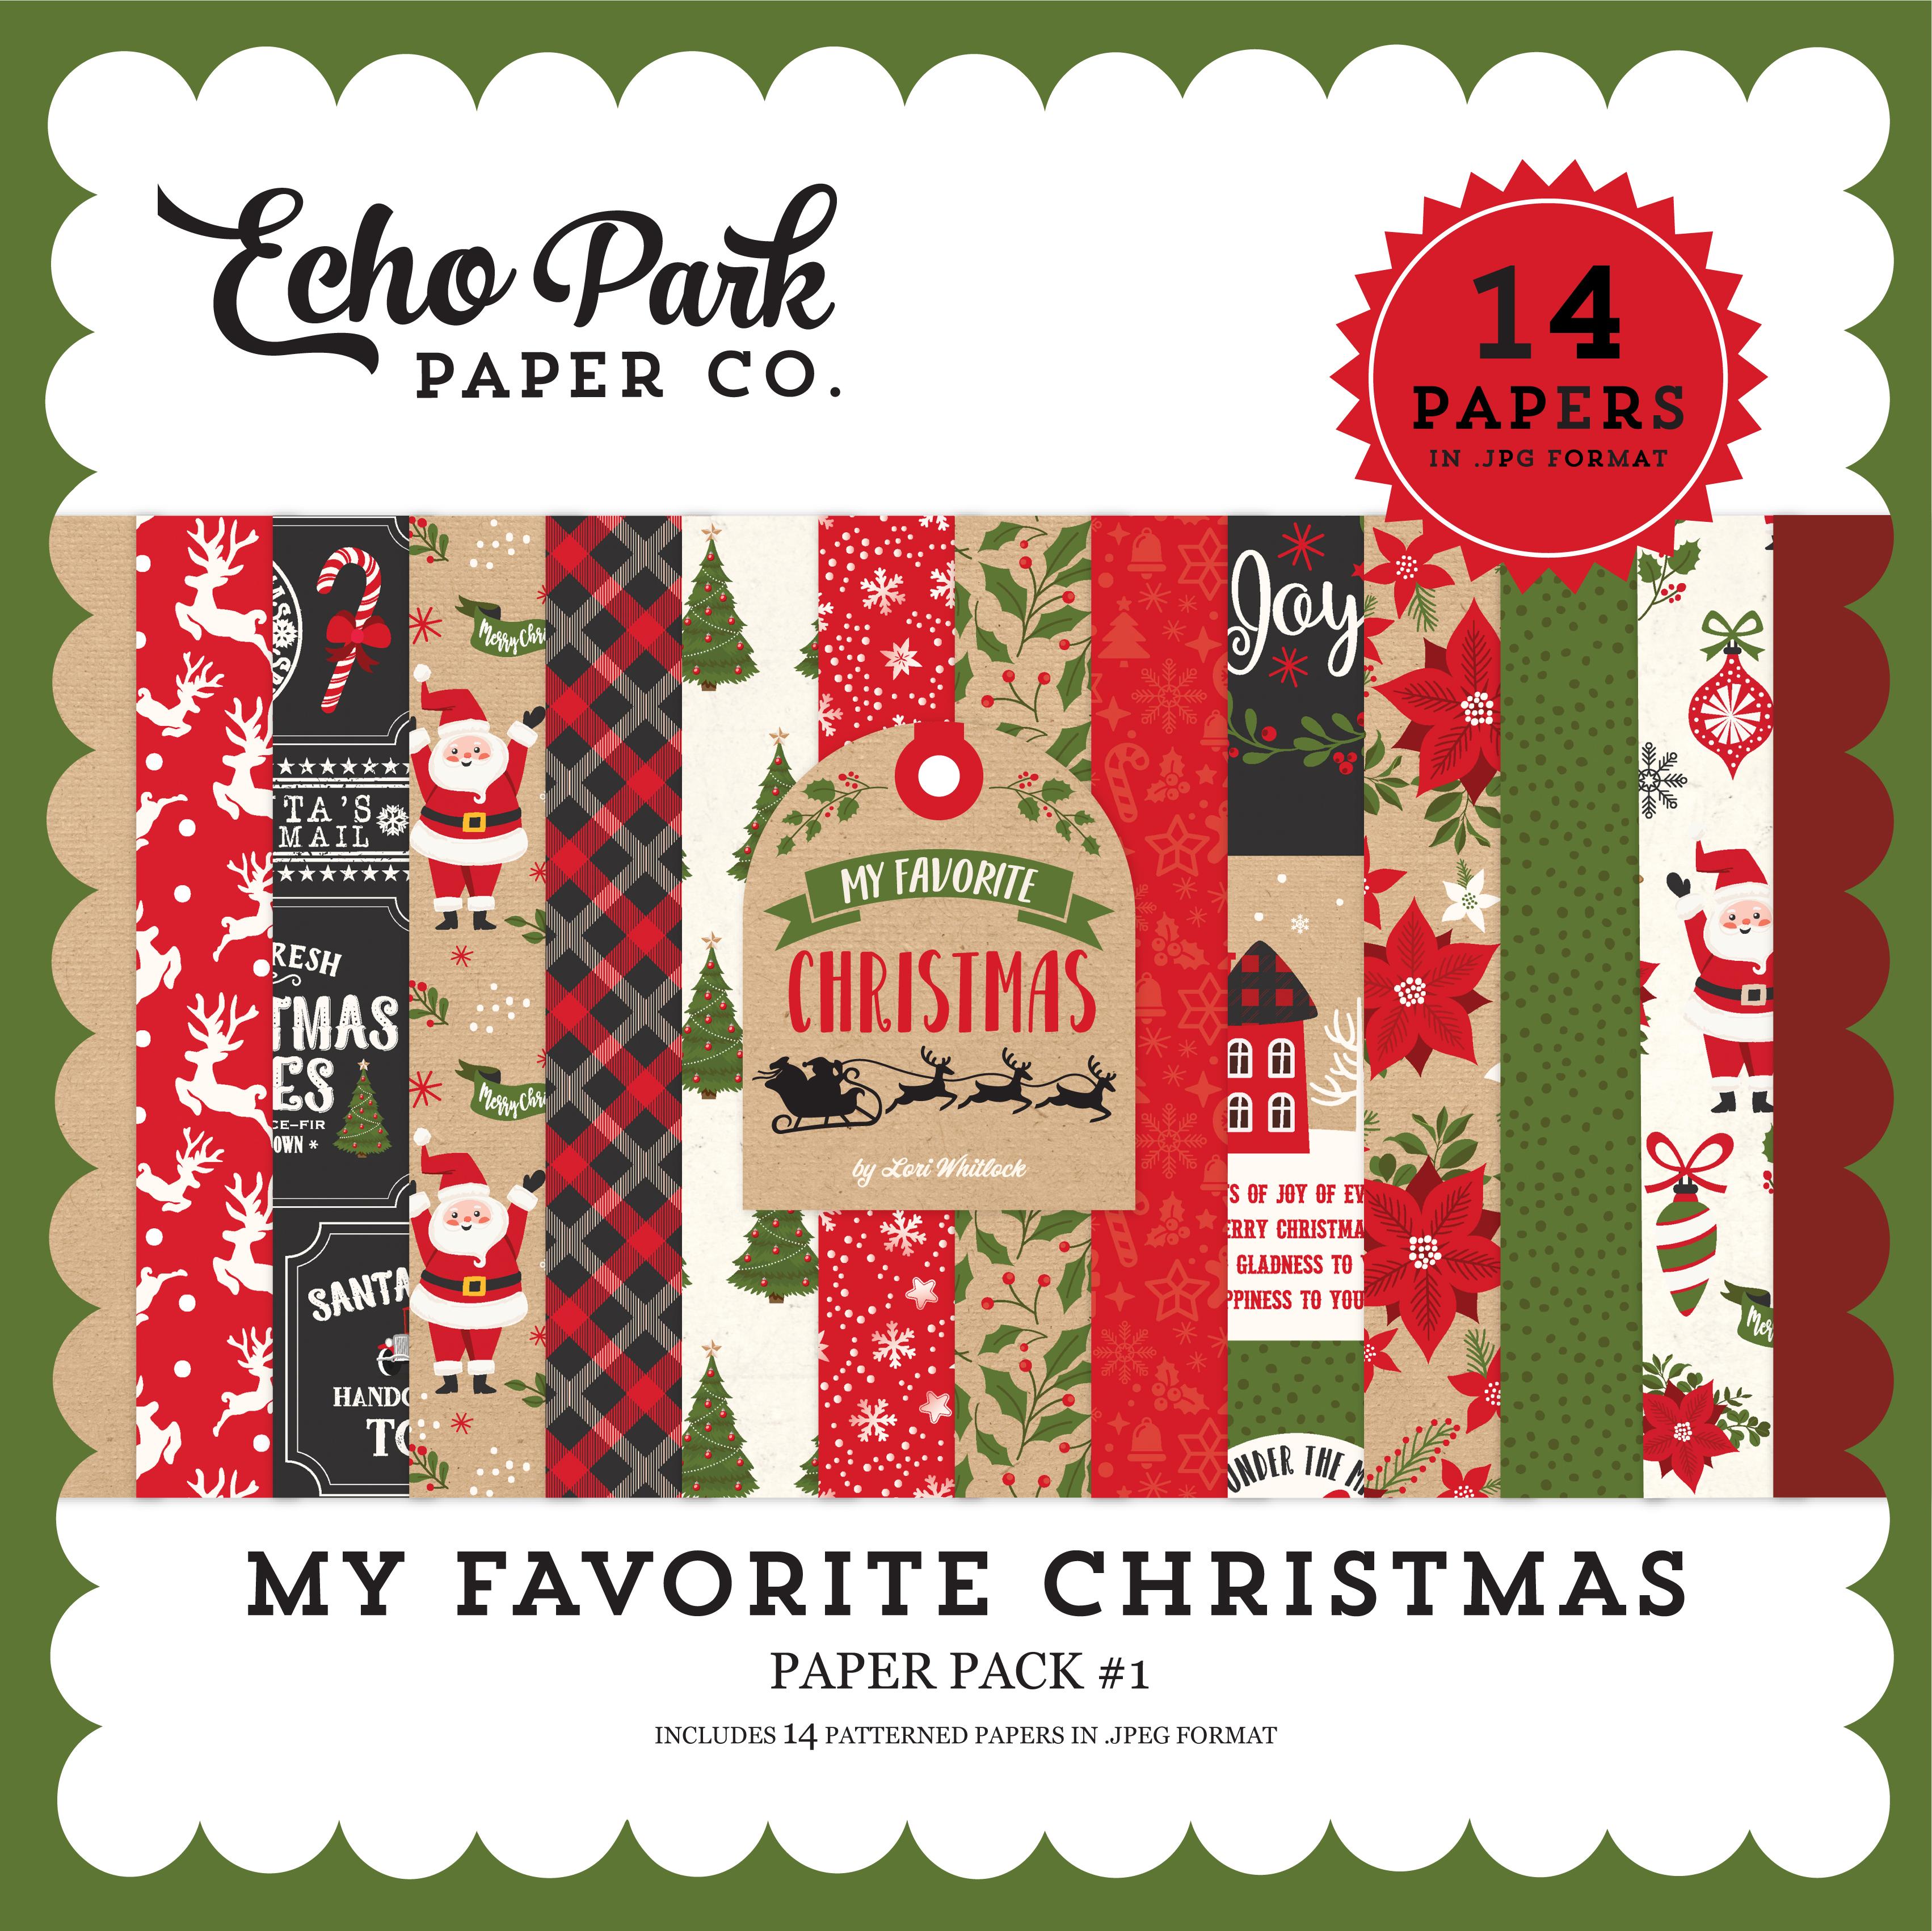 My Favorite Christmas Paper Pack #1